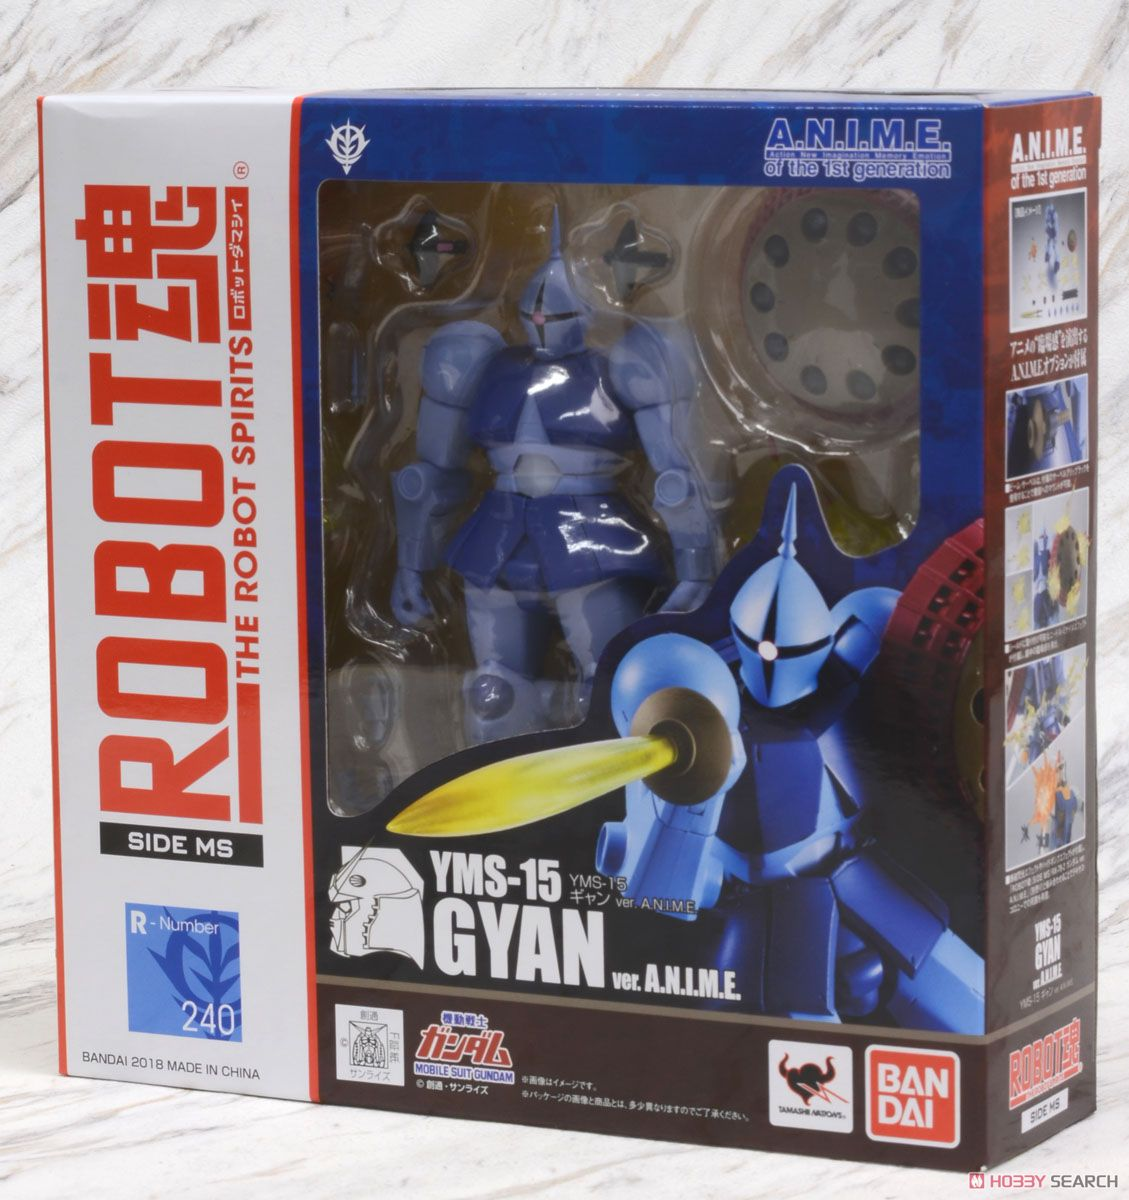 ROBOT魂 機動戦士ガンダム  YMS-15 ギャン ver. A.N.I.M.E.に関する画像7